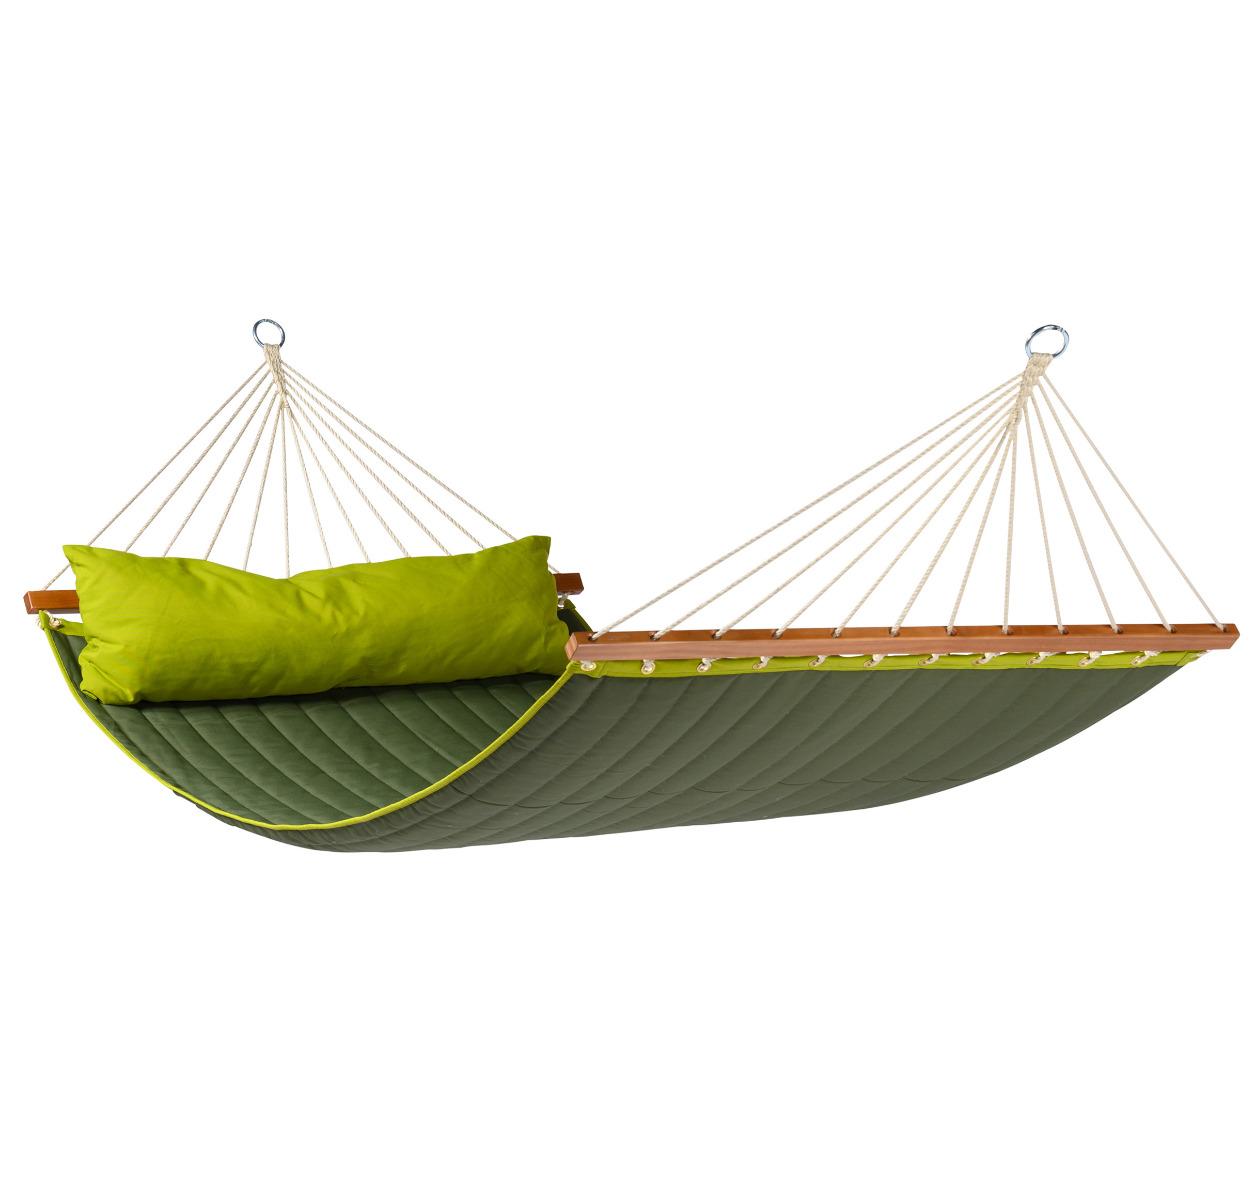 Hangmat 'American' Green - Tropilex �